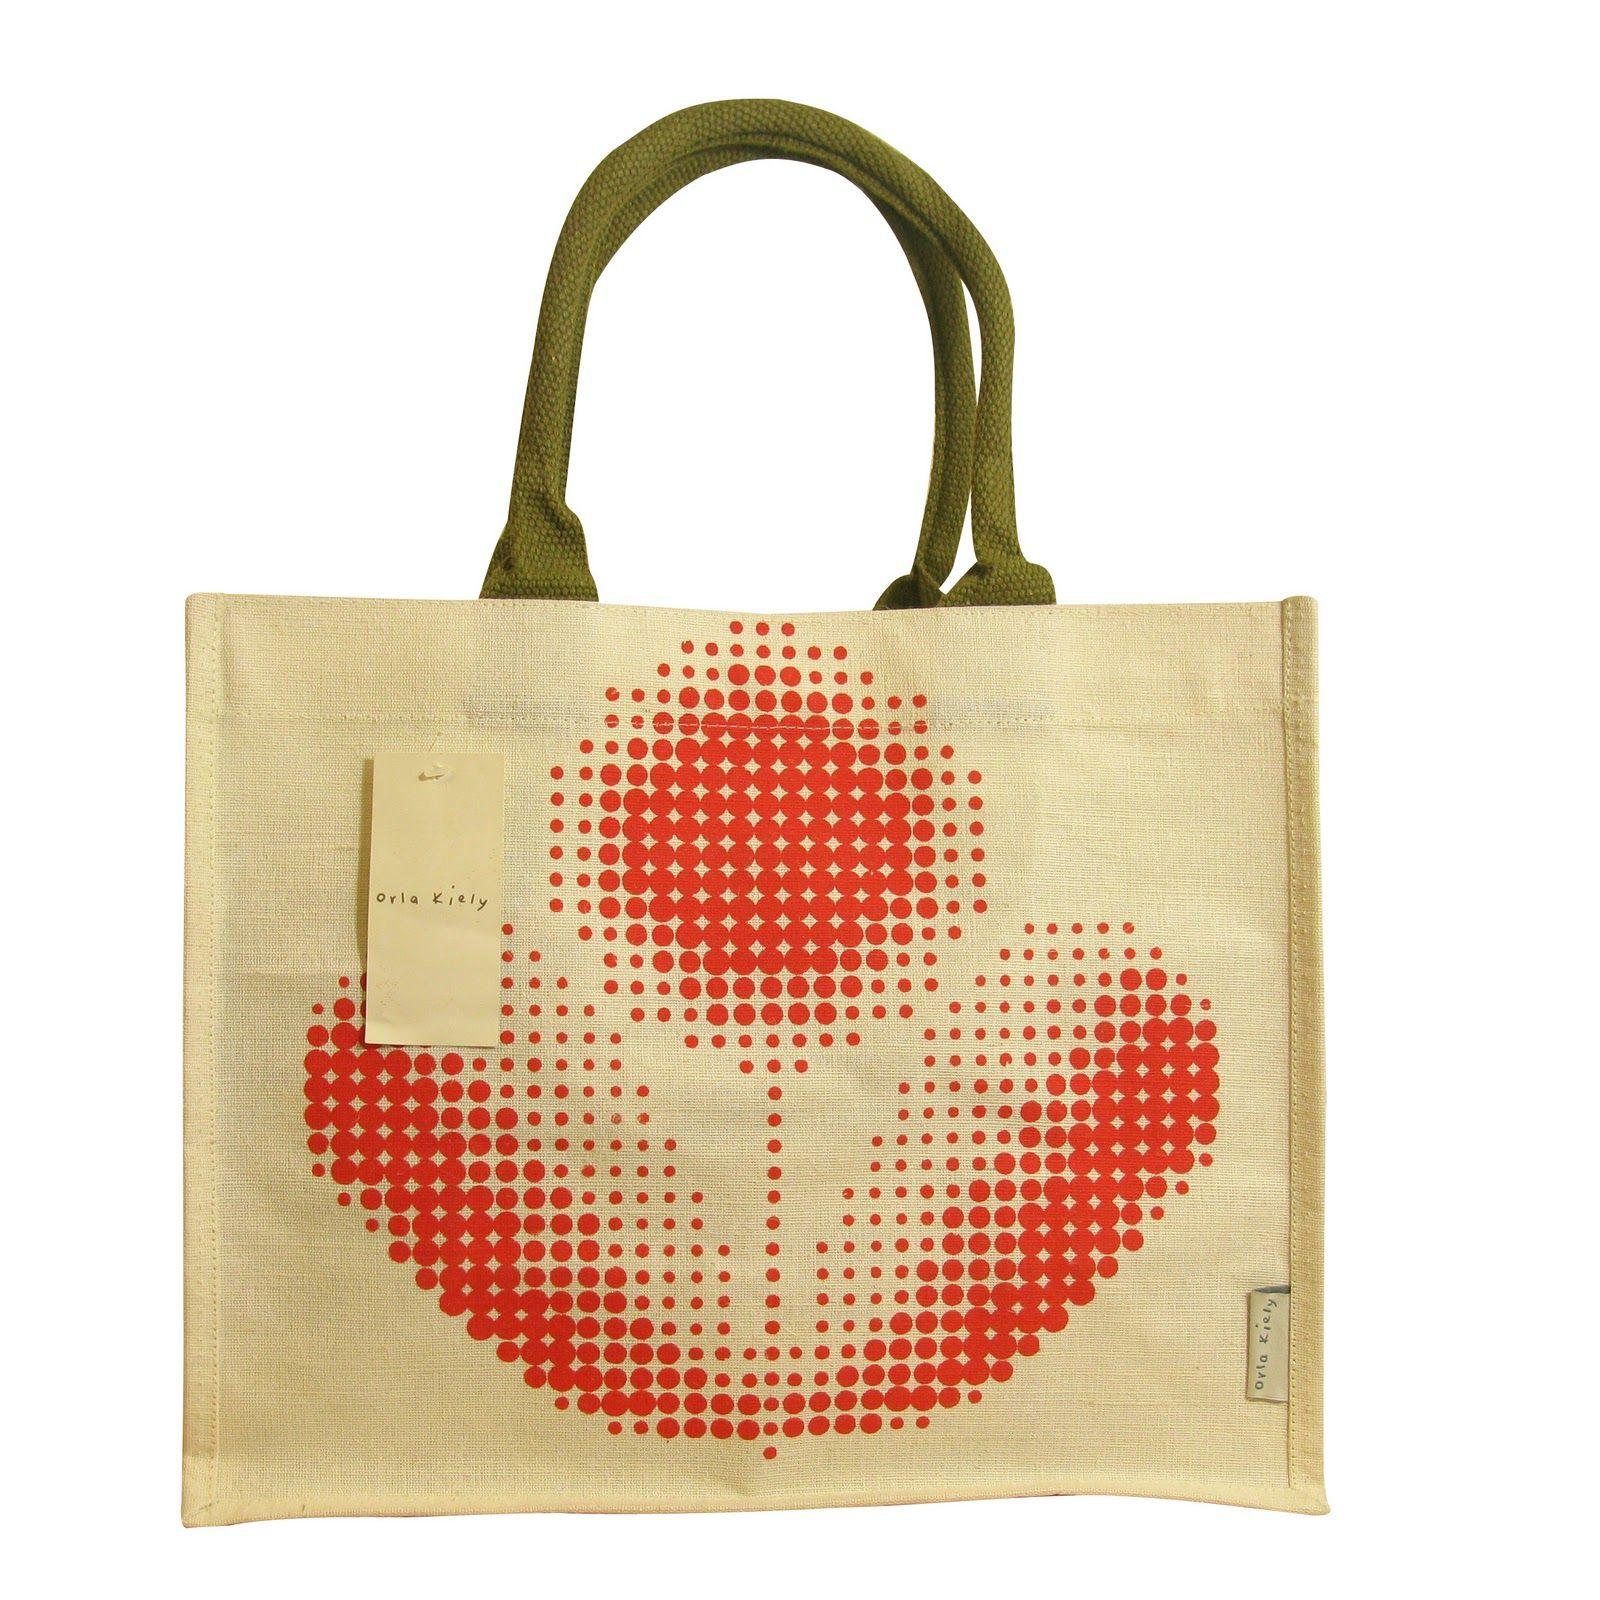 eaa0d709db Orla Kiely Jute Bag Collection for Tesco